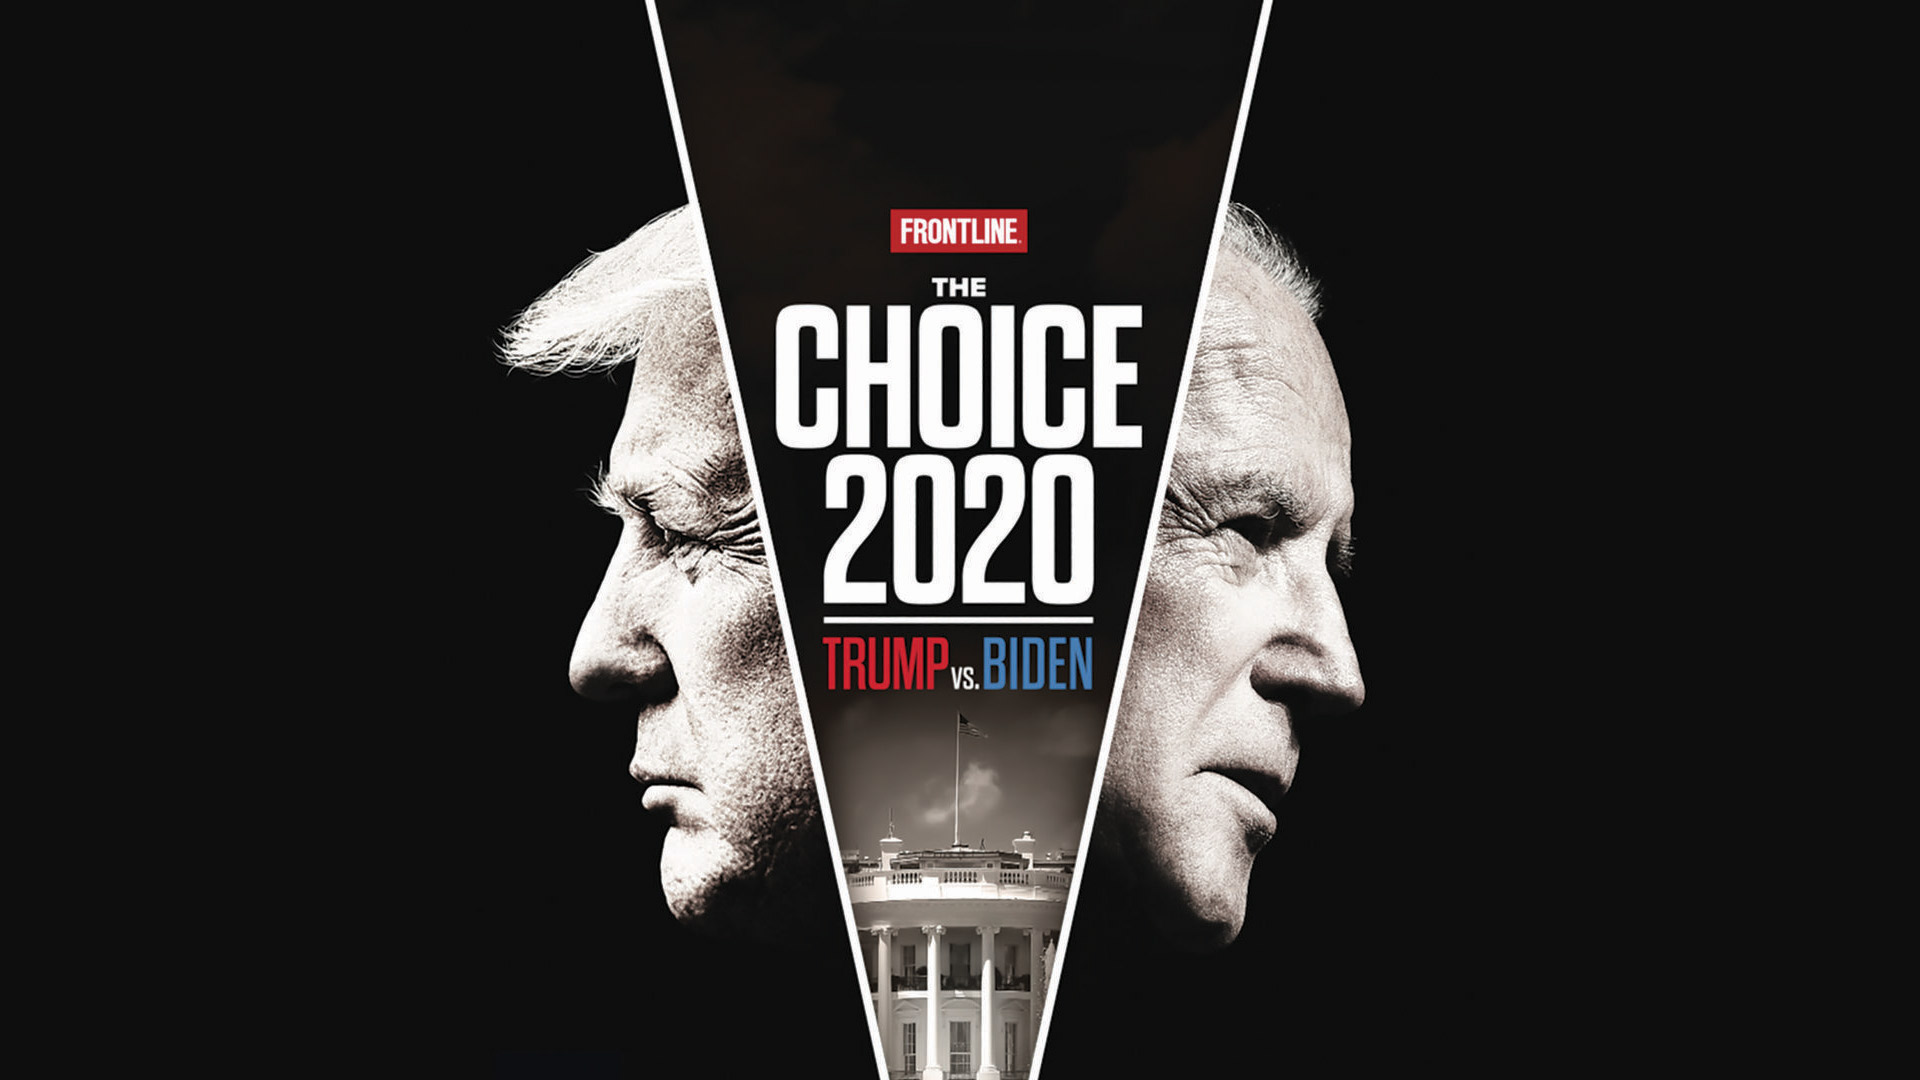 Frontline The Choice Trump vs Biden